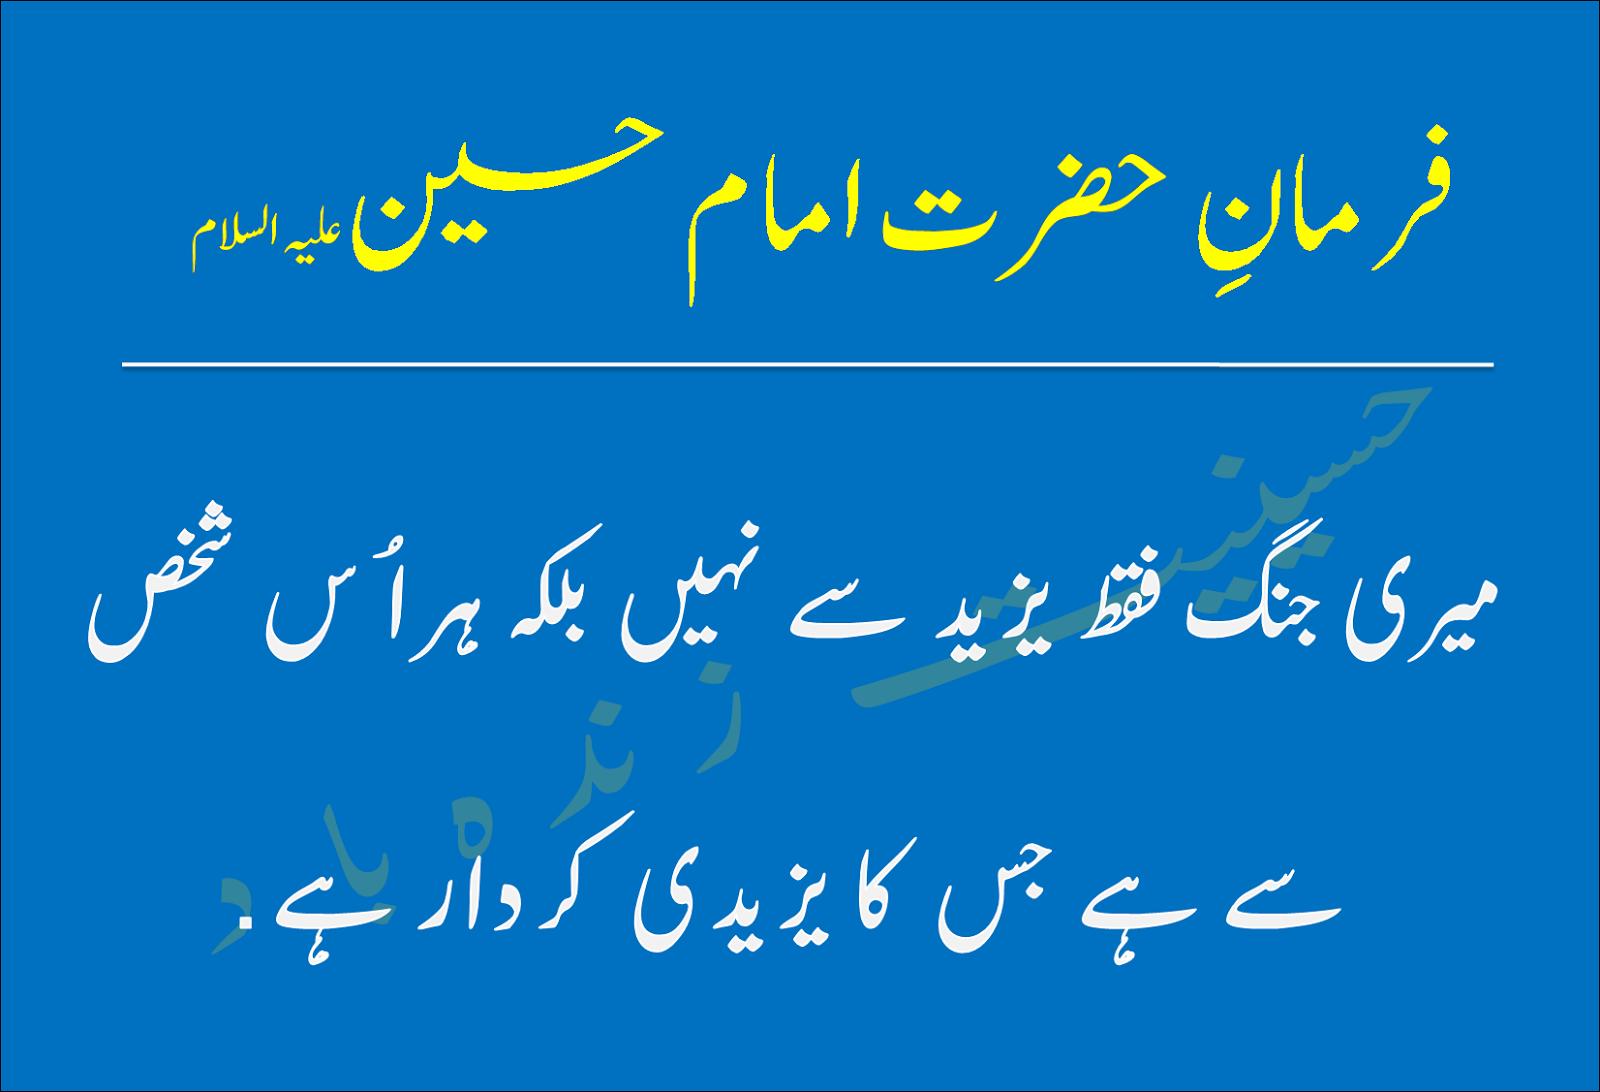 Hazrat Imam HUSSAIN As